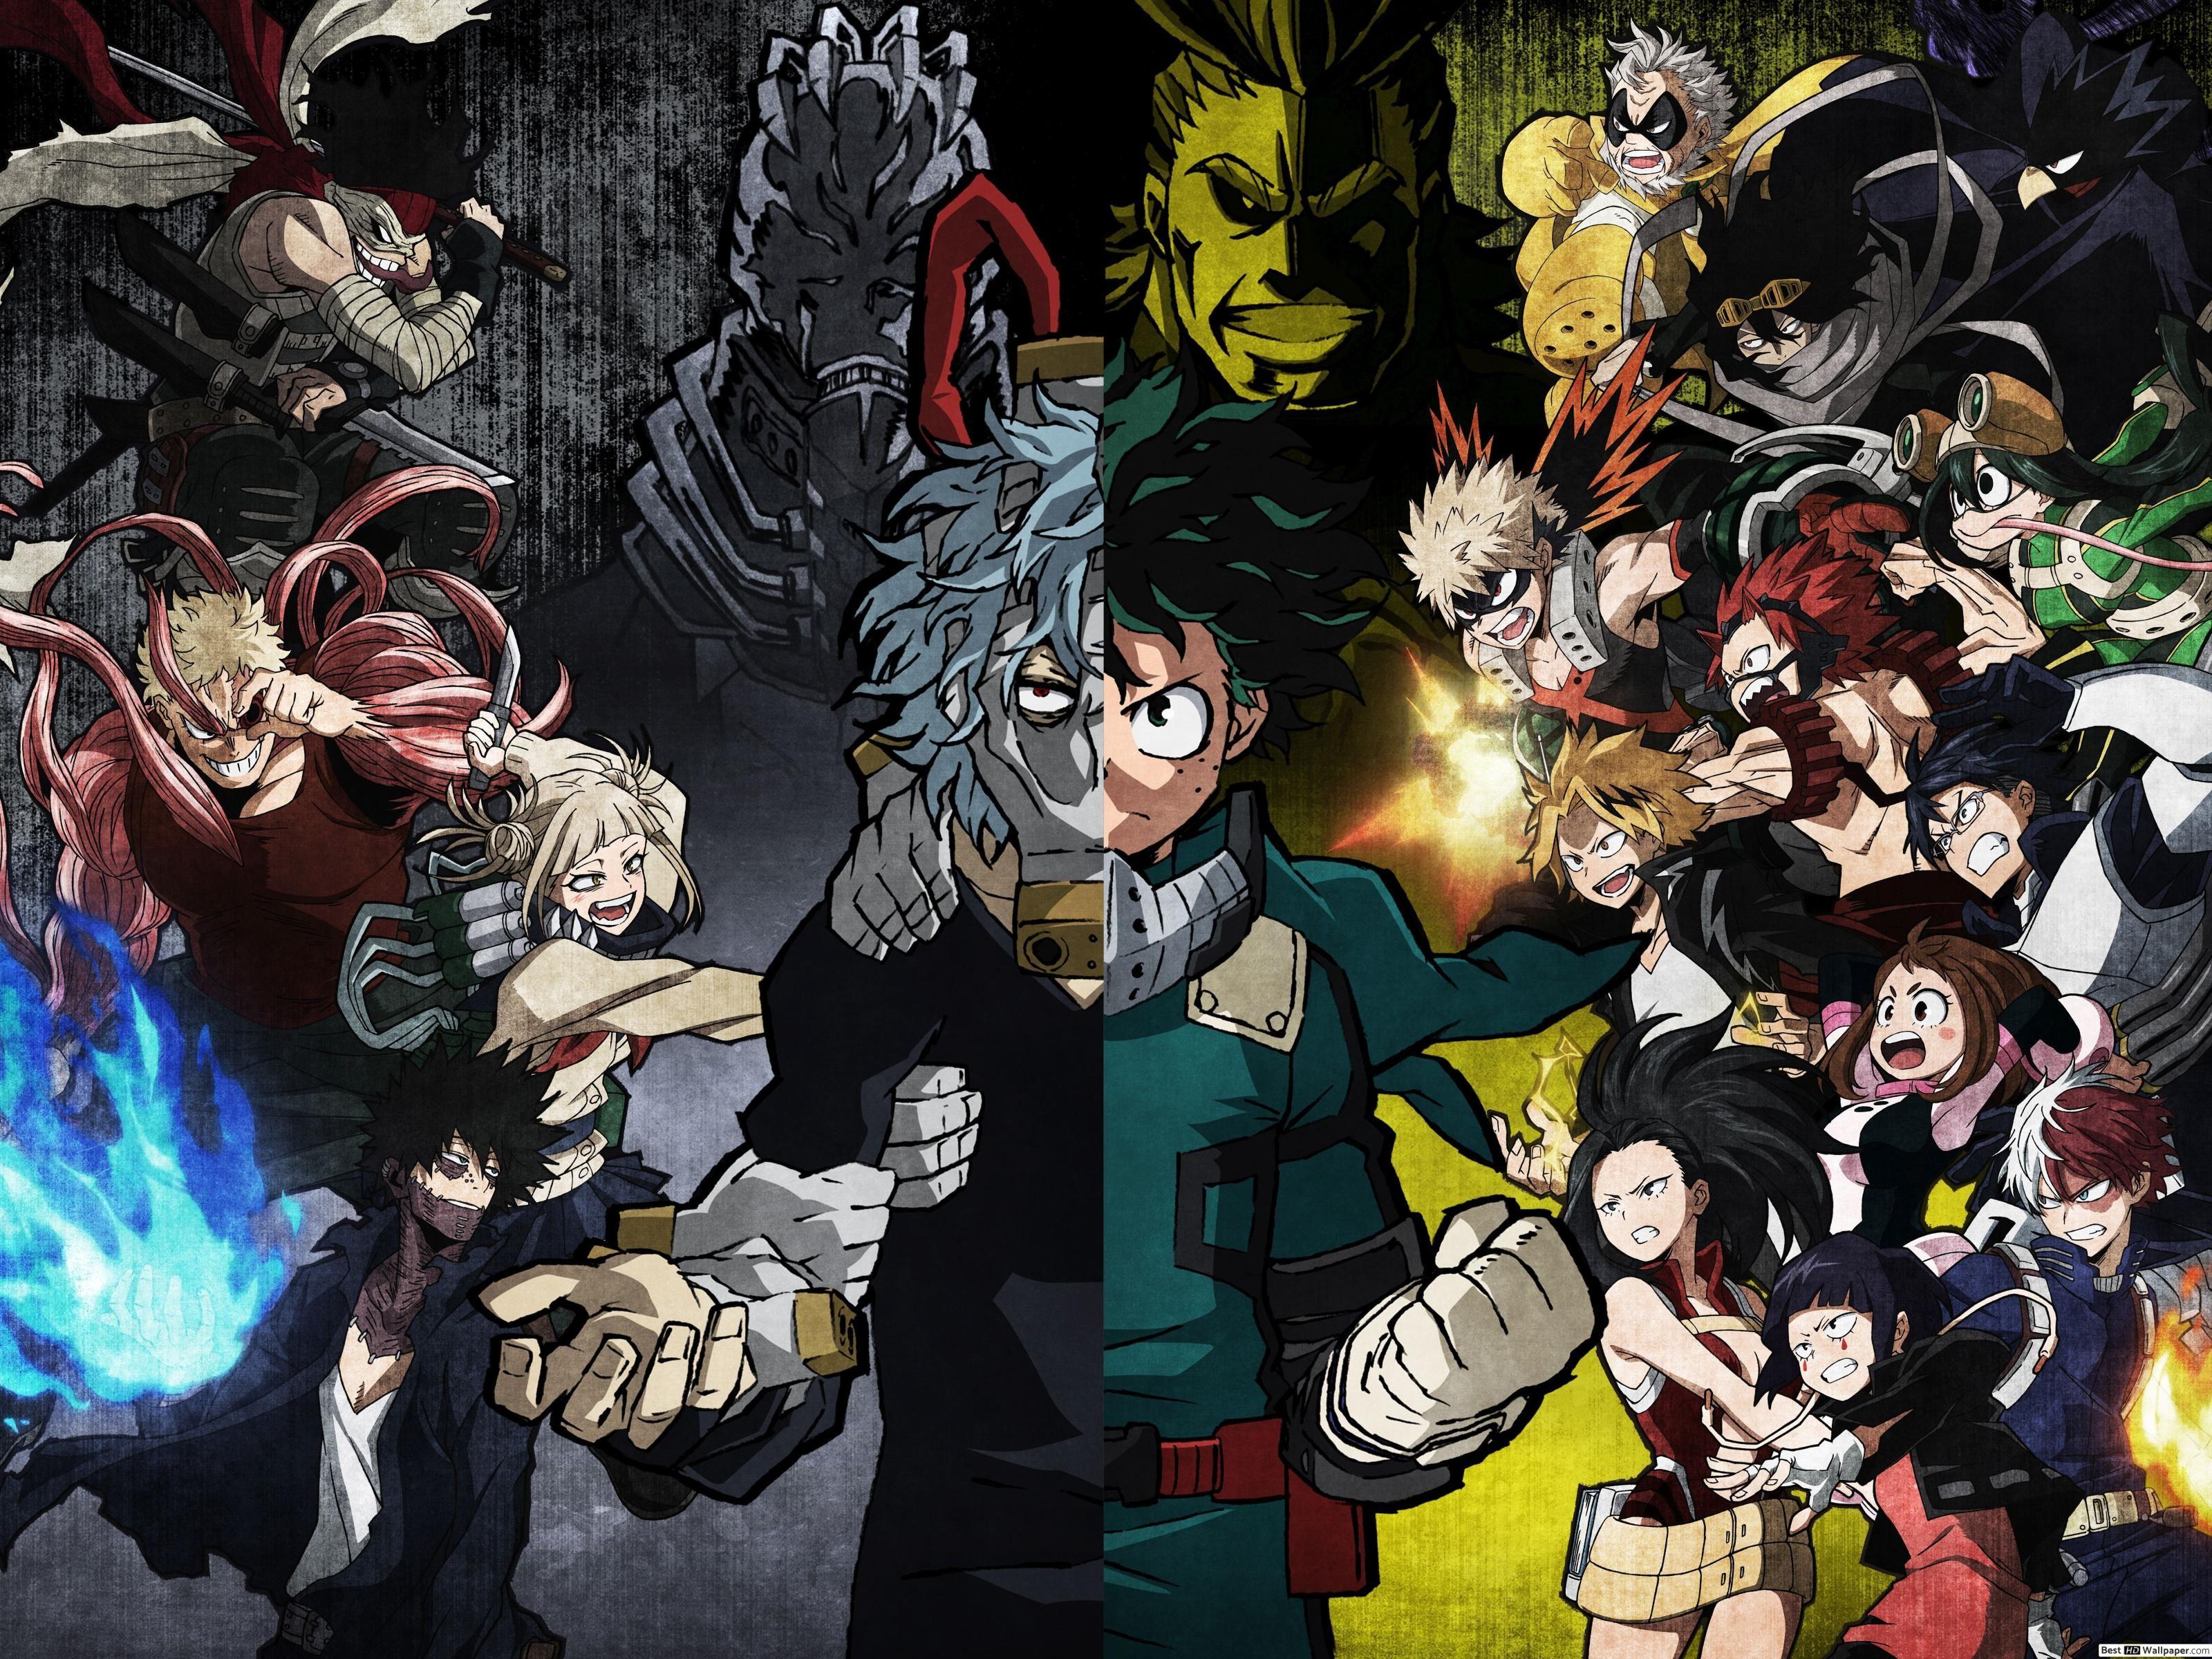 My Hero Academia Villains Wallpapers Top Free My Hero Academia Villains Backgrounds Wallpaperaccess Hero Wallpaper My Hero Anime